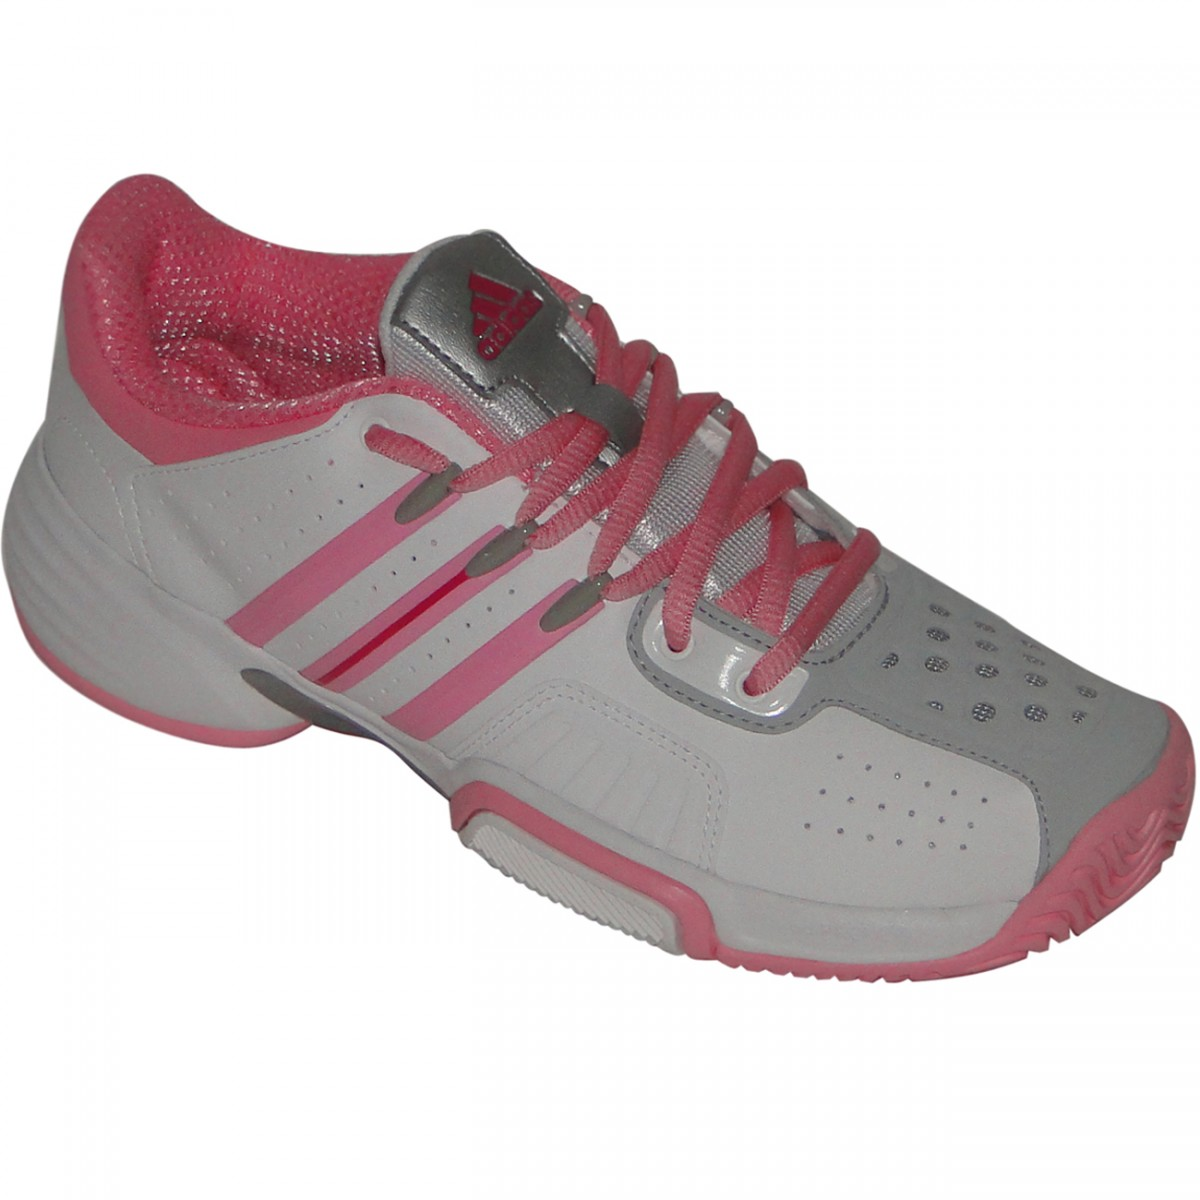 f2626146b70 Tênis Adidas Barricade Team 7583 - BRANCO ROSA - Chuteira Nike ...